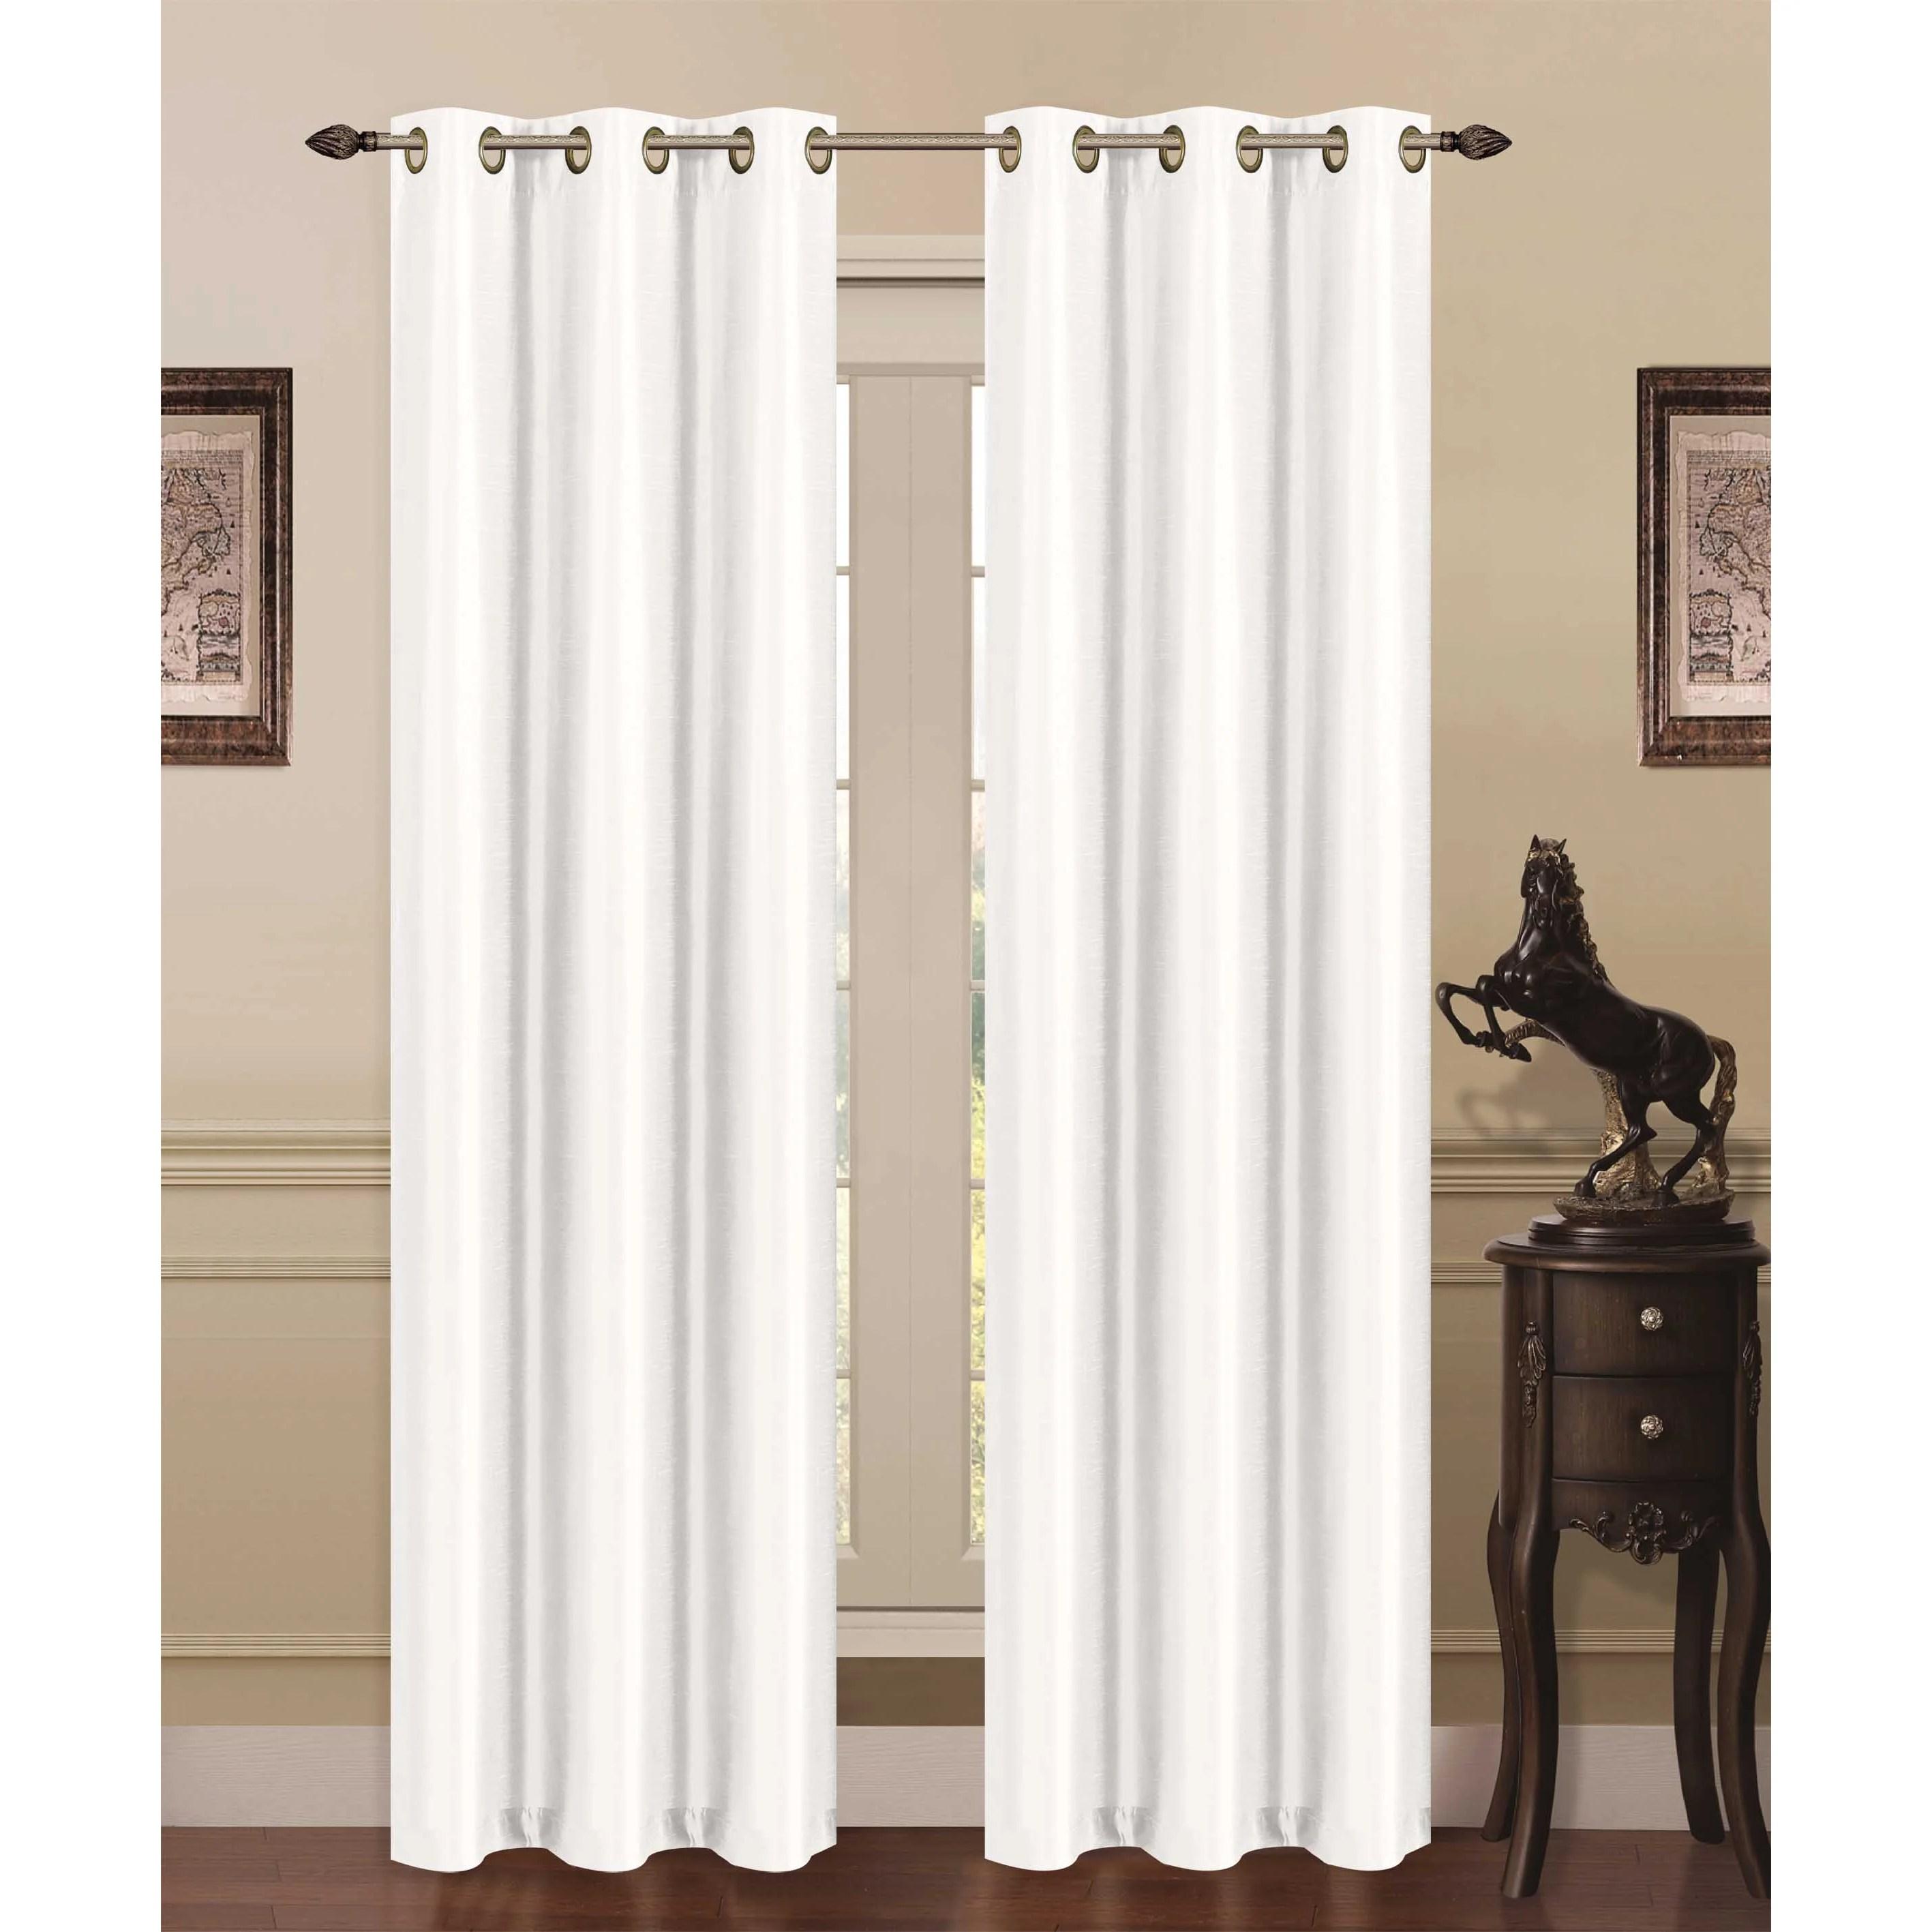 Ju0026V Textiles Blackout Thermal Curtain Panels U0026 Reviews Wayfair